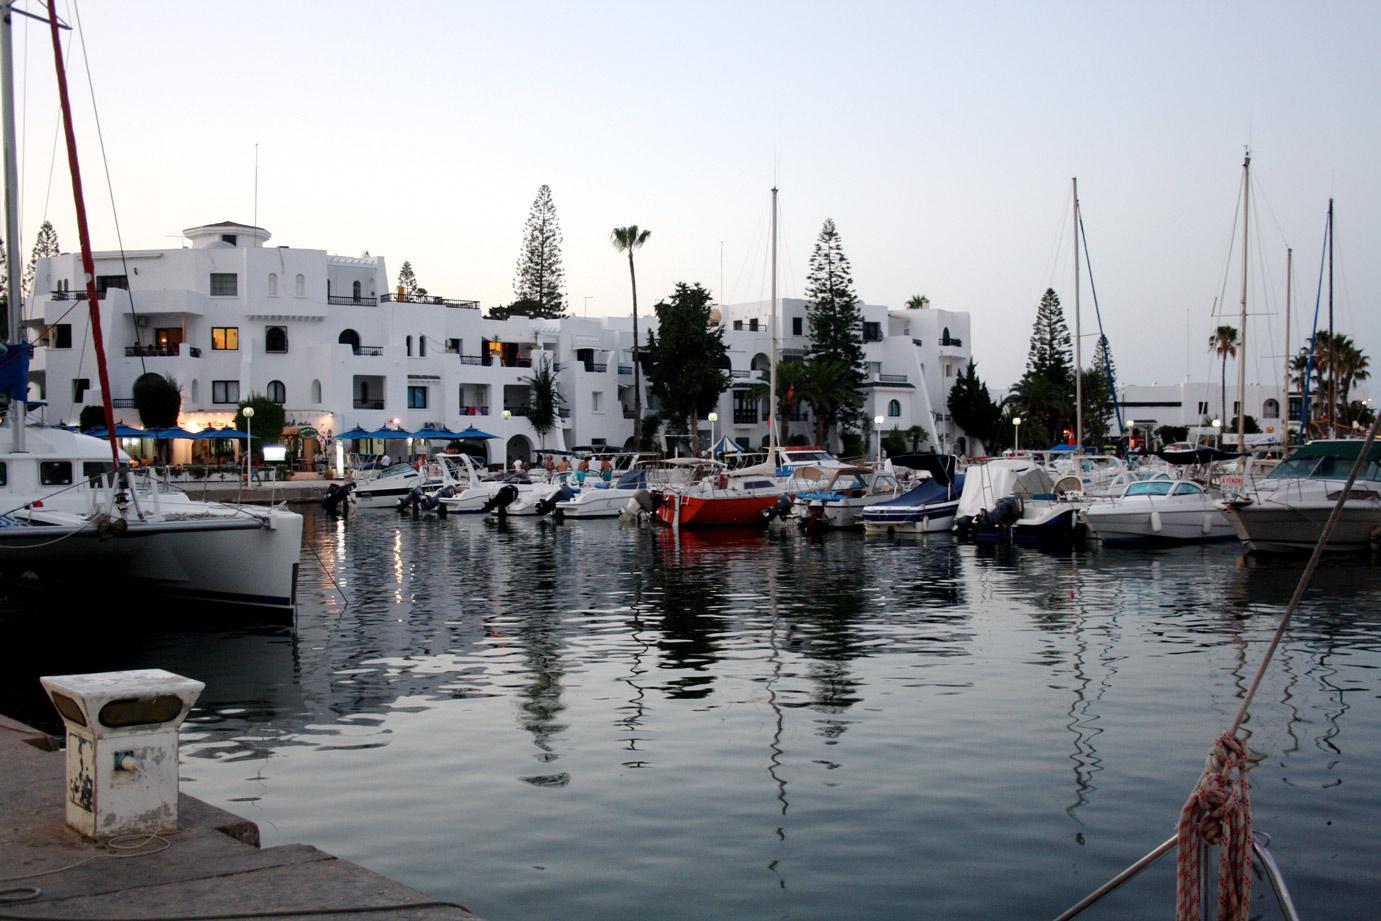 TUNISIA PHOTO DIARY III. 2